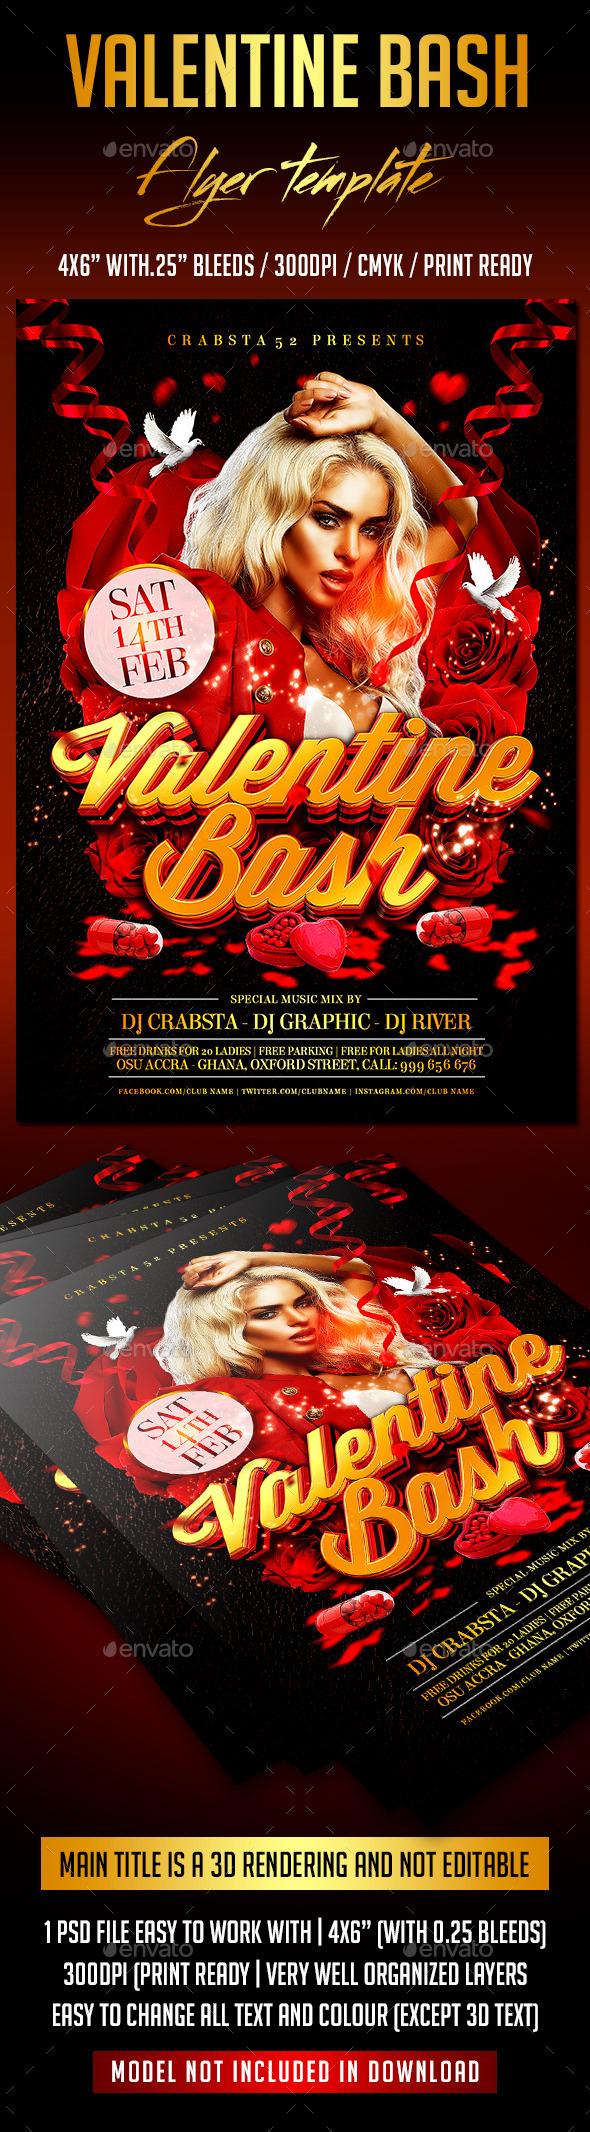 Valentine Bash Flyer Template